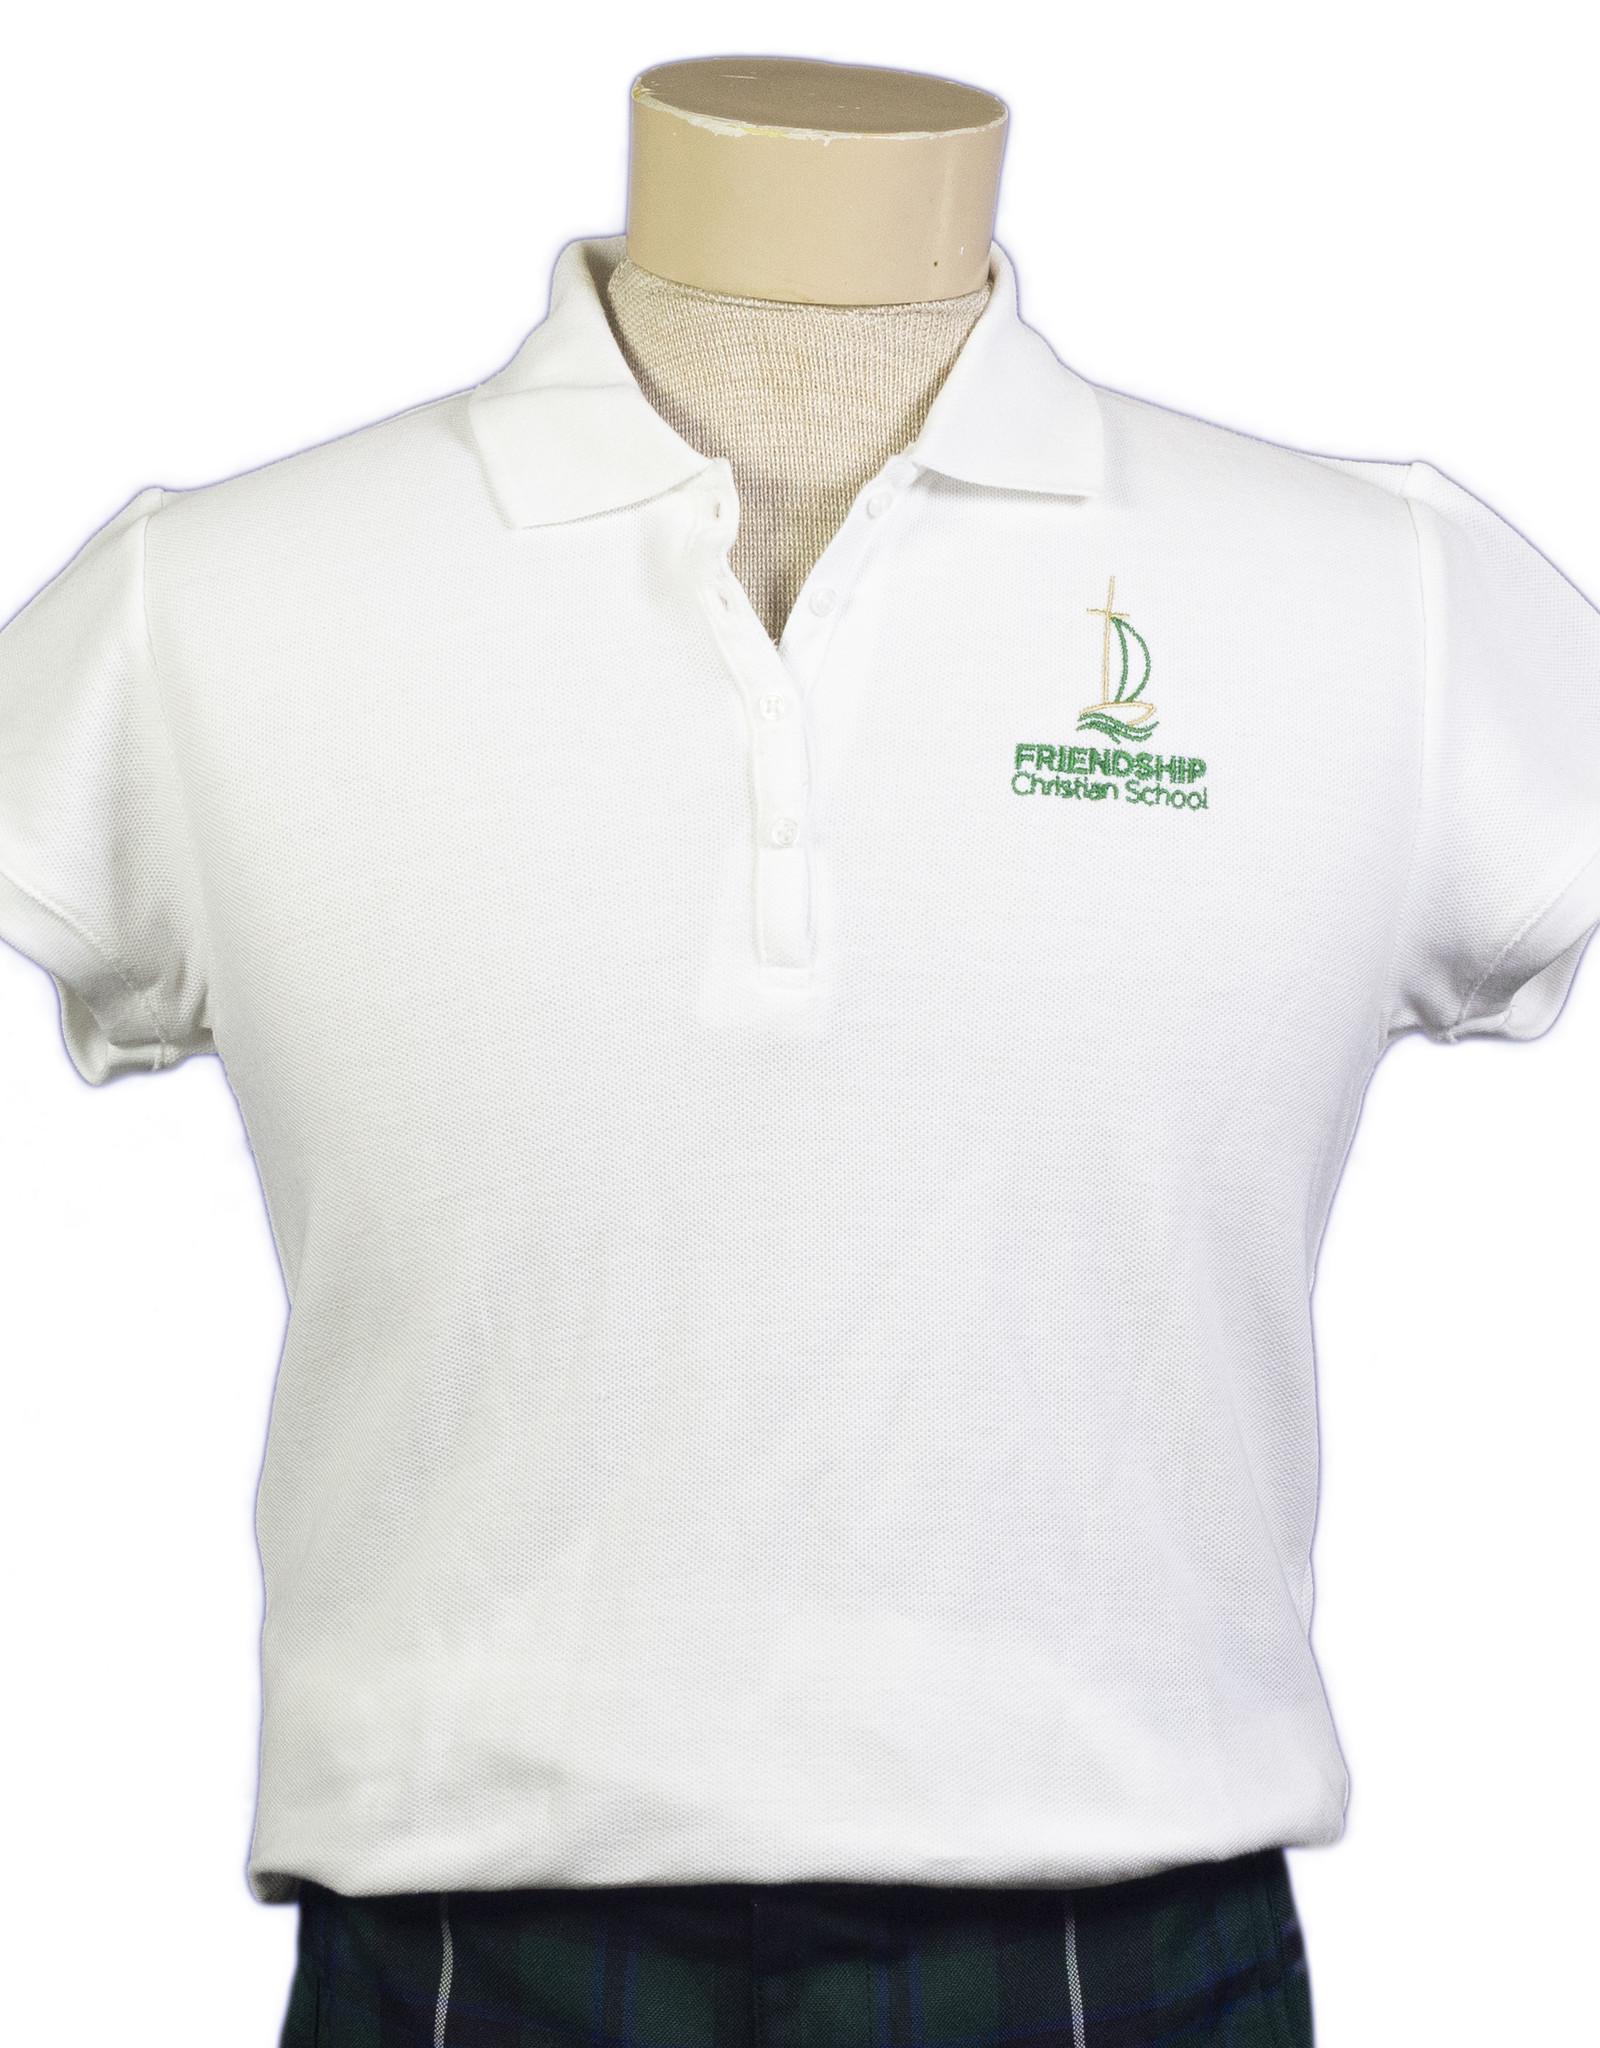 Polo - Female Cut - Short Sleeve -Pique - Adult